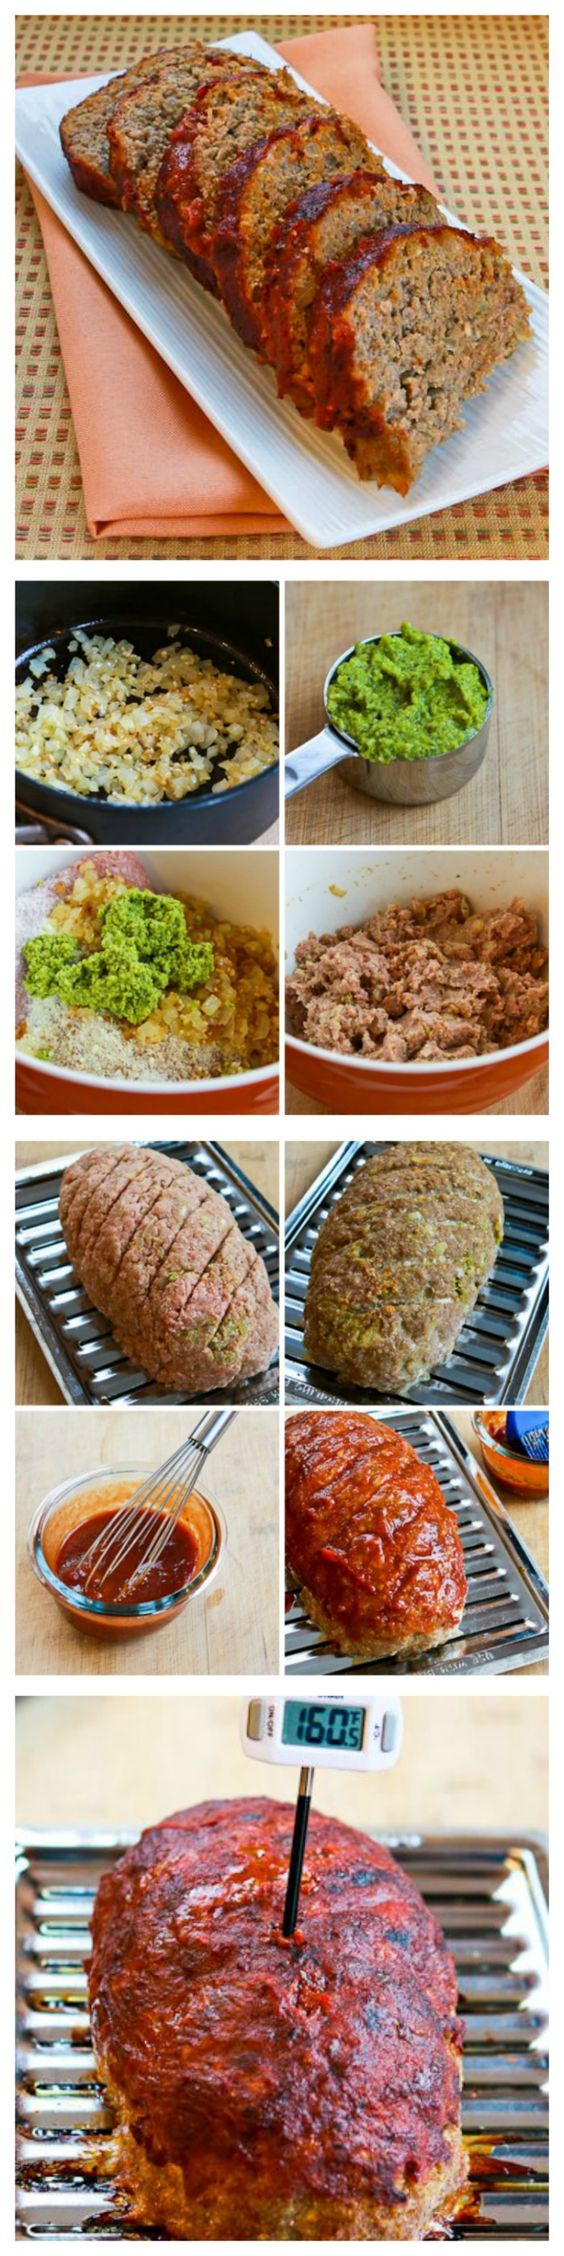 Turkey Pesto Meatloaf with Tomato Sauce | Pinterest | Pesto, Turkey ...